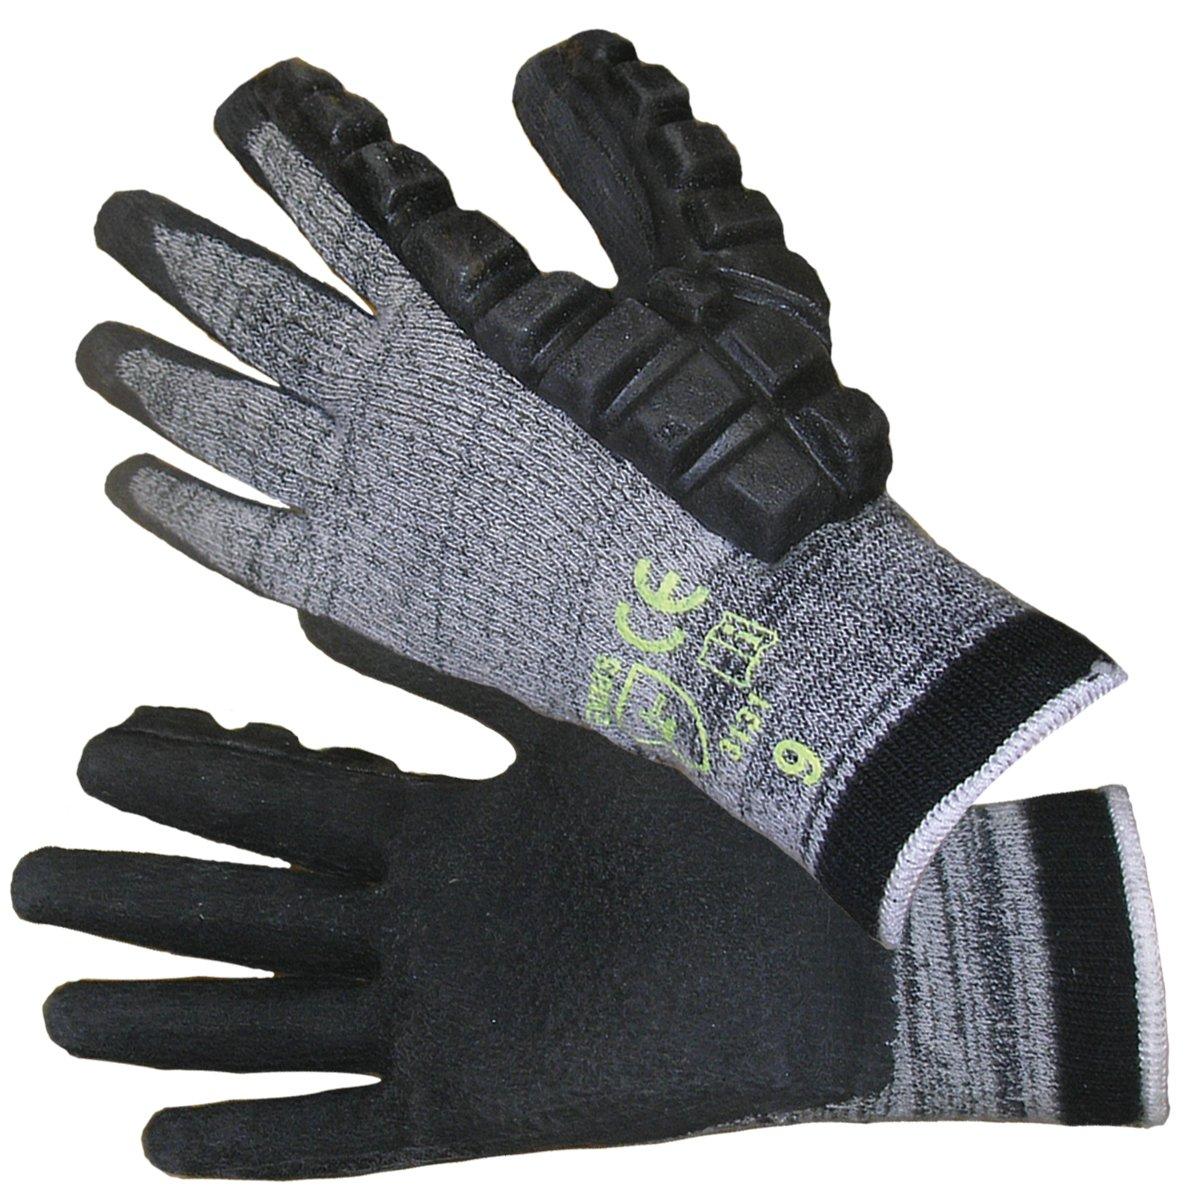 Impacto DP470051 Anti-Impact Hammer Glove, Grey